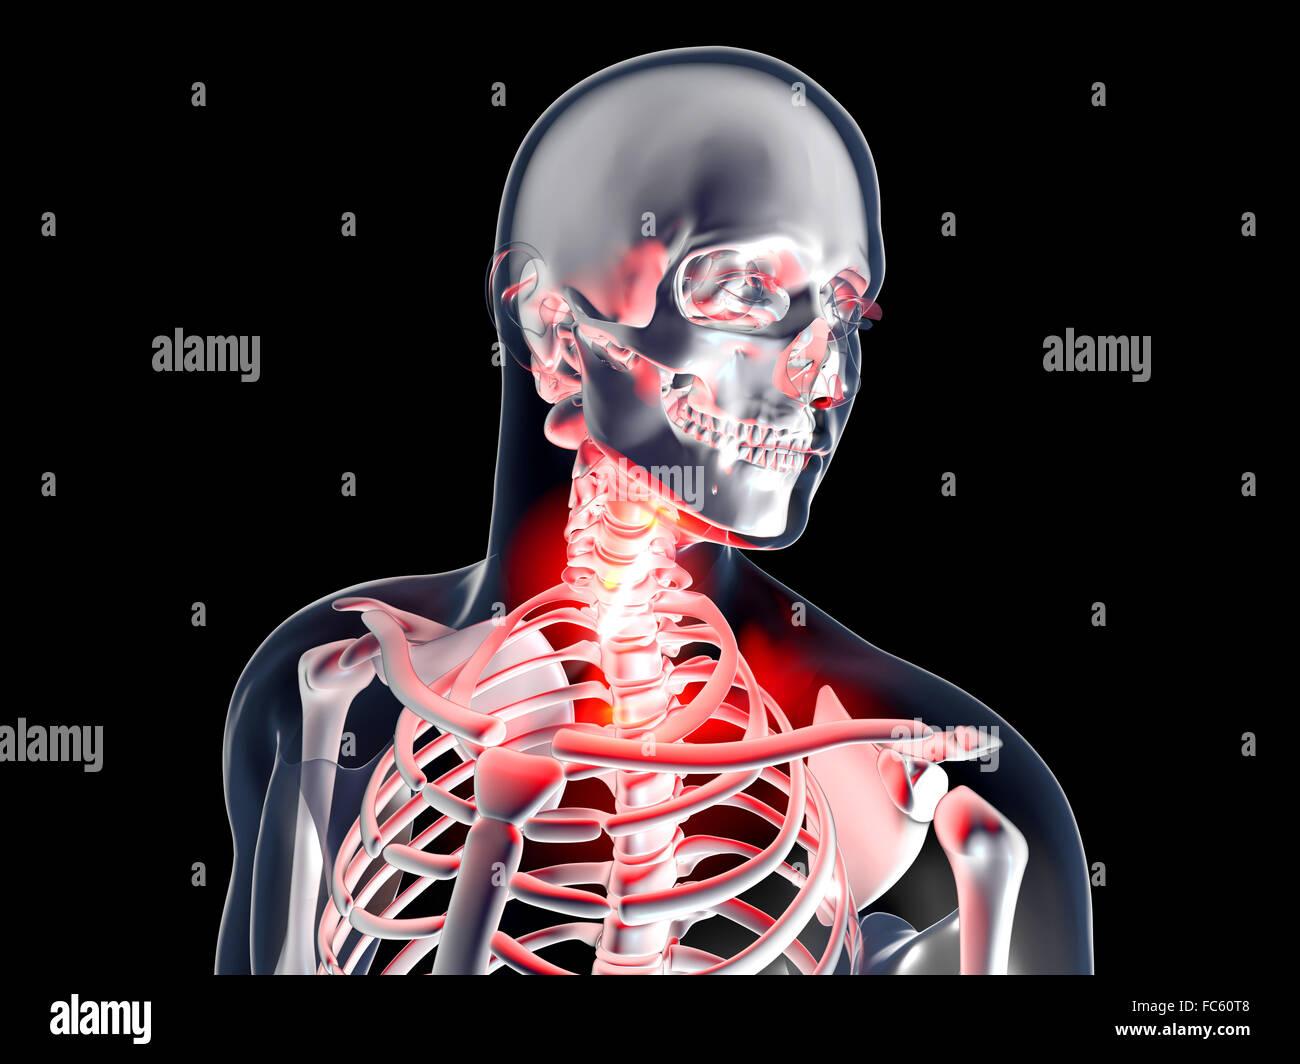 Sore Throat - Anatomy Stock Photo: 93560104 - Alamy